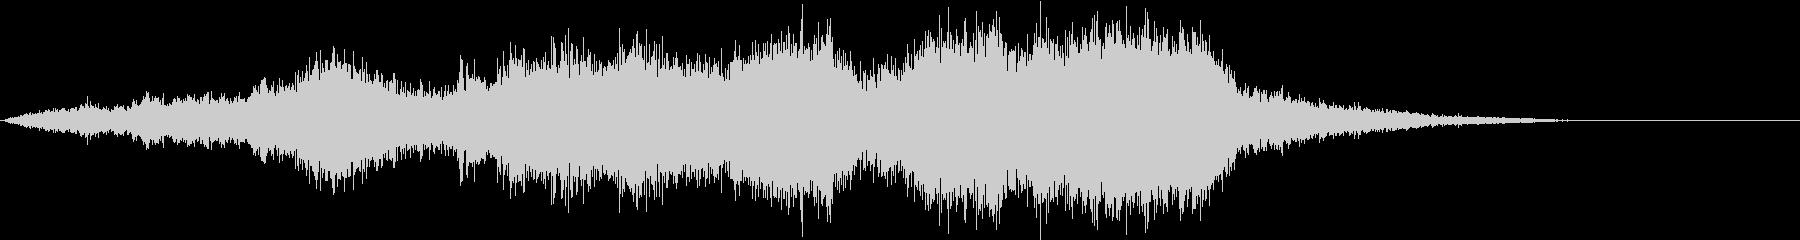 CINEMATIC RISER_21の未再生の波形